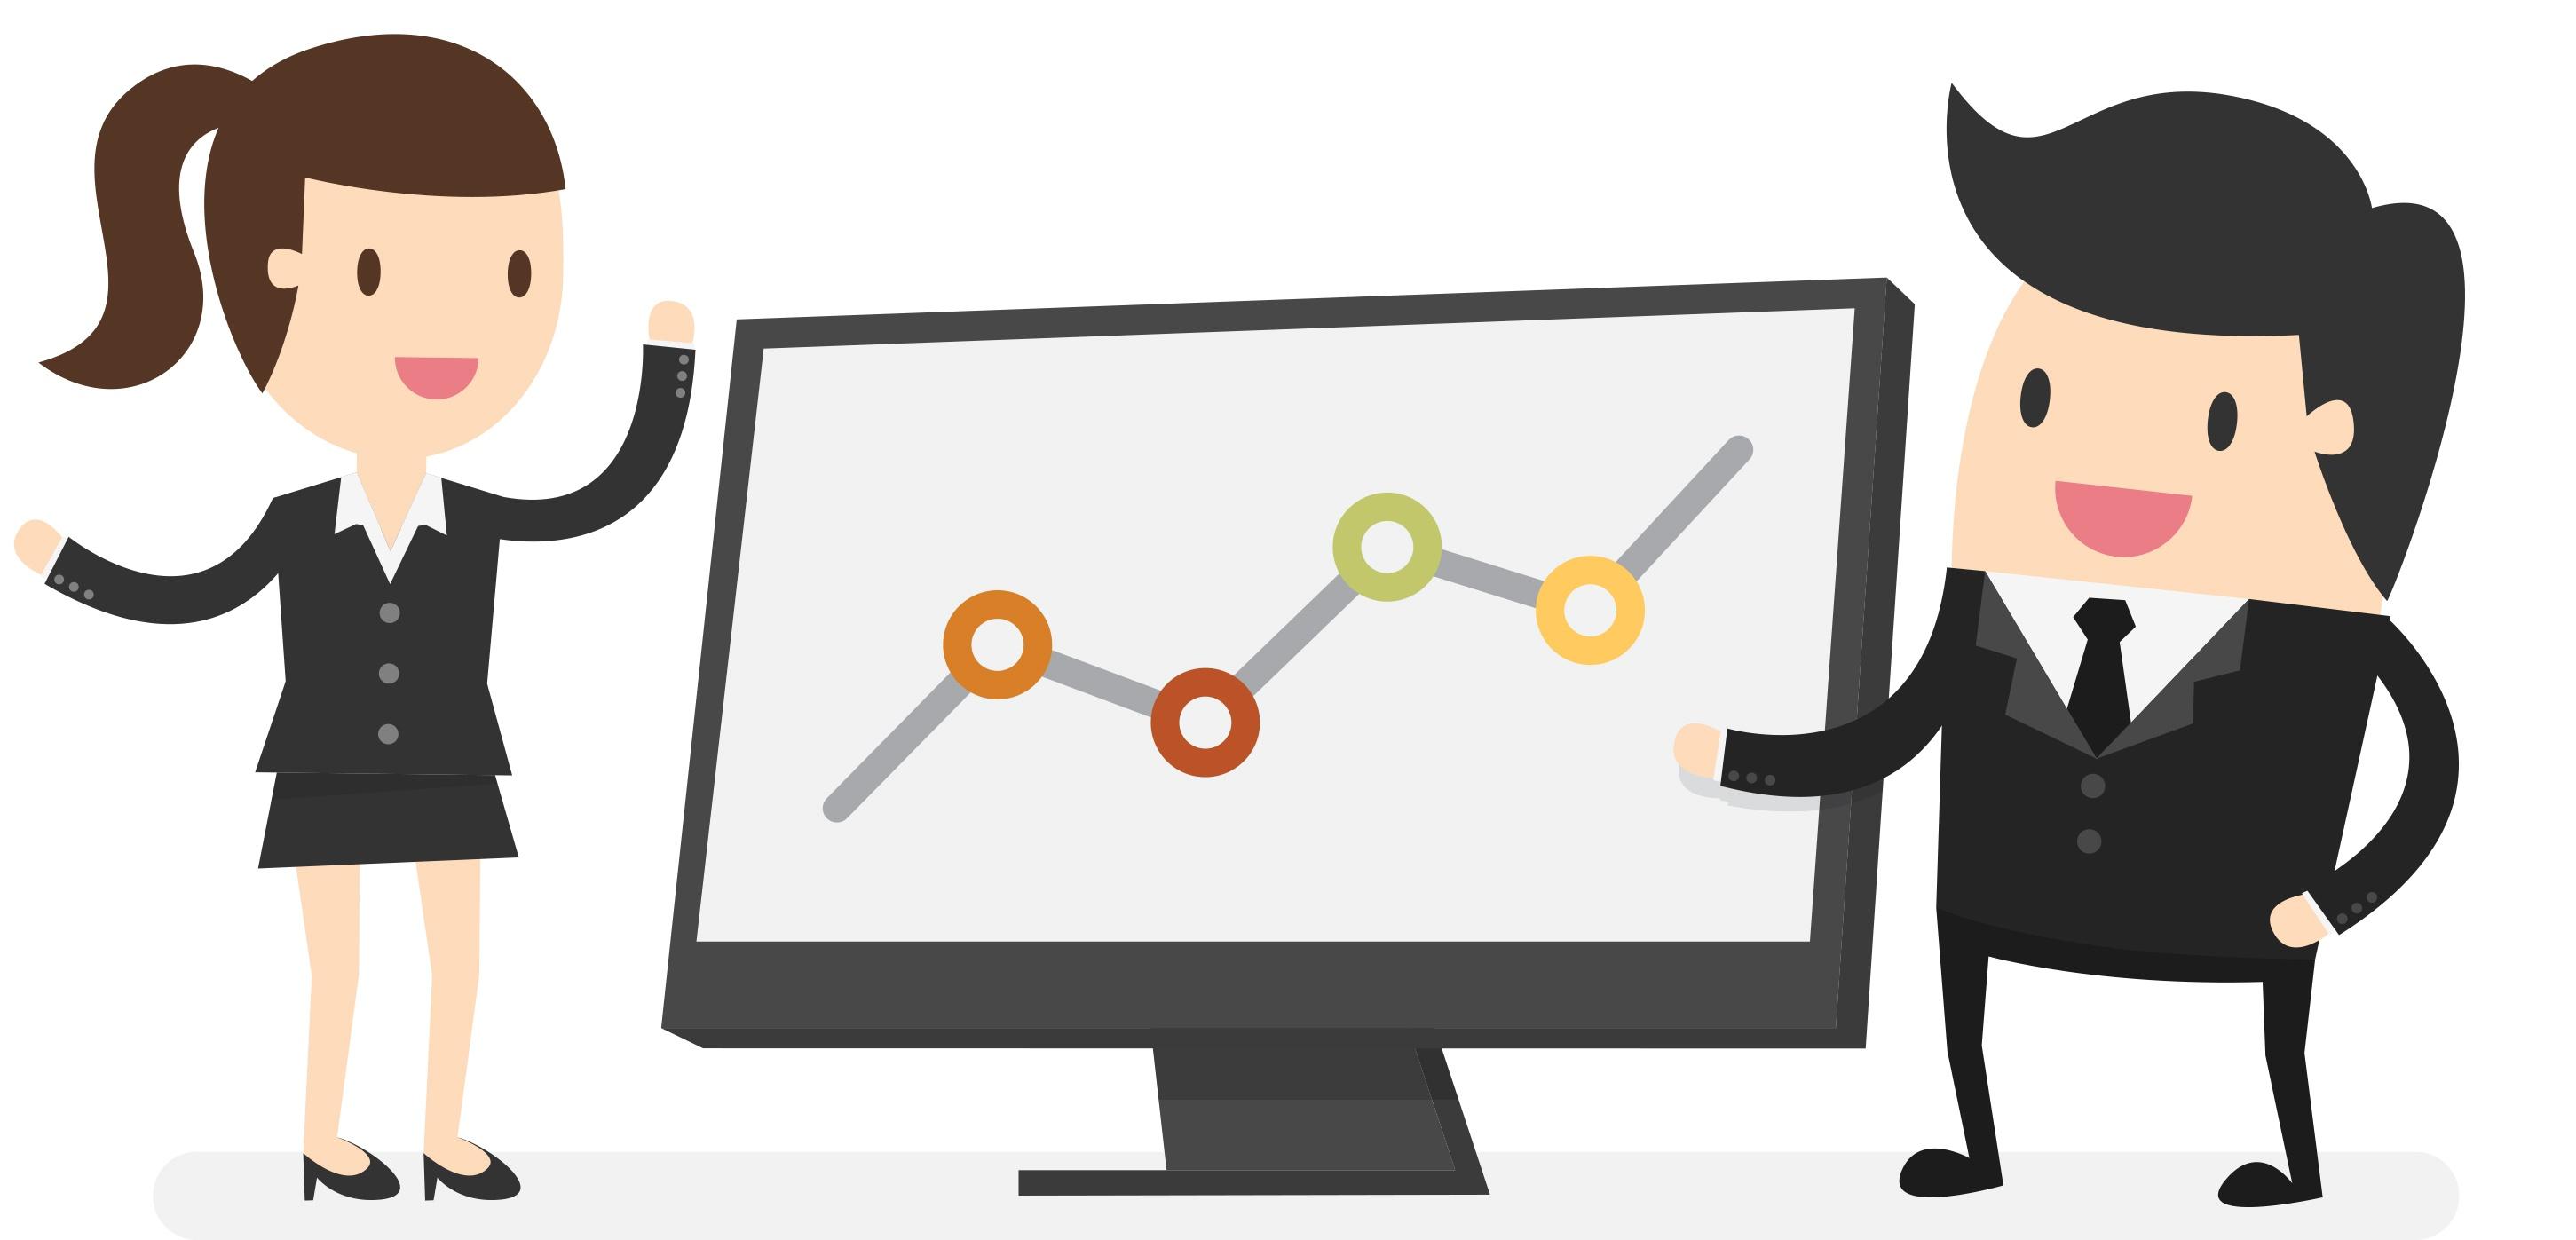 Training company staff managing system data